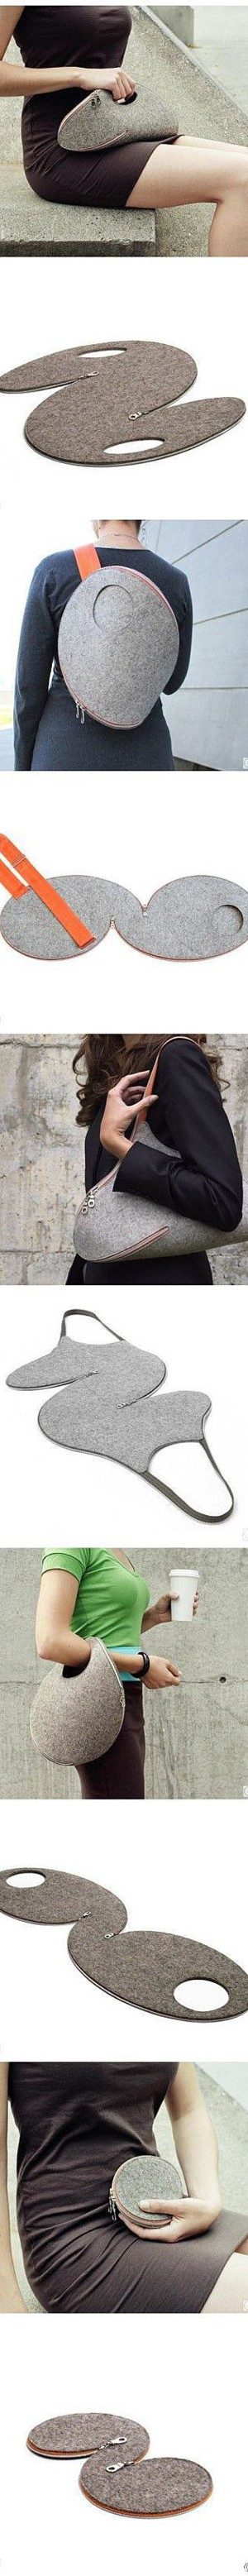 Чудные сумочки